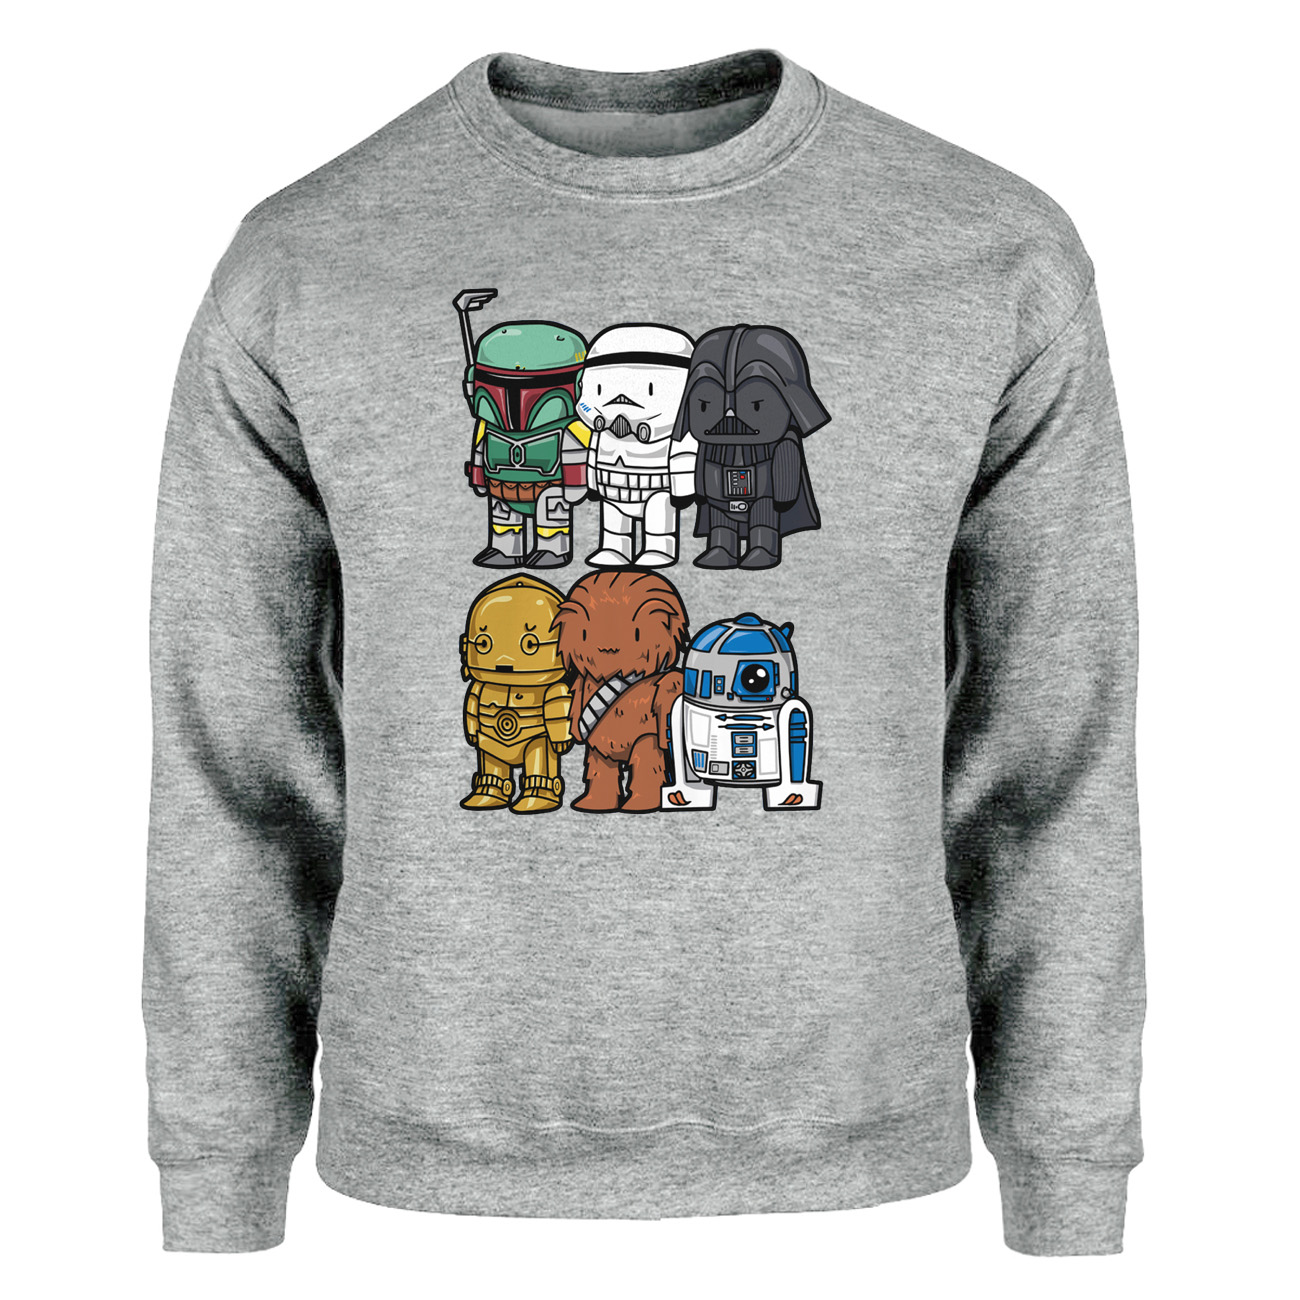 Star Wars Hoodies Sweatshirts Men Yoda Darth Vader Crewneck Sweatshirt Winter Autumn Starwars Science Fiction Movies Streetwear